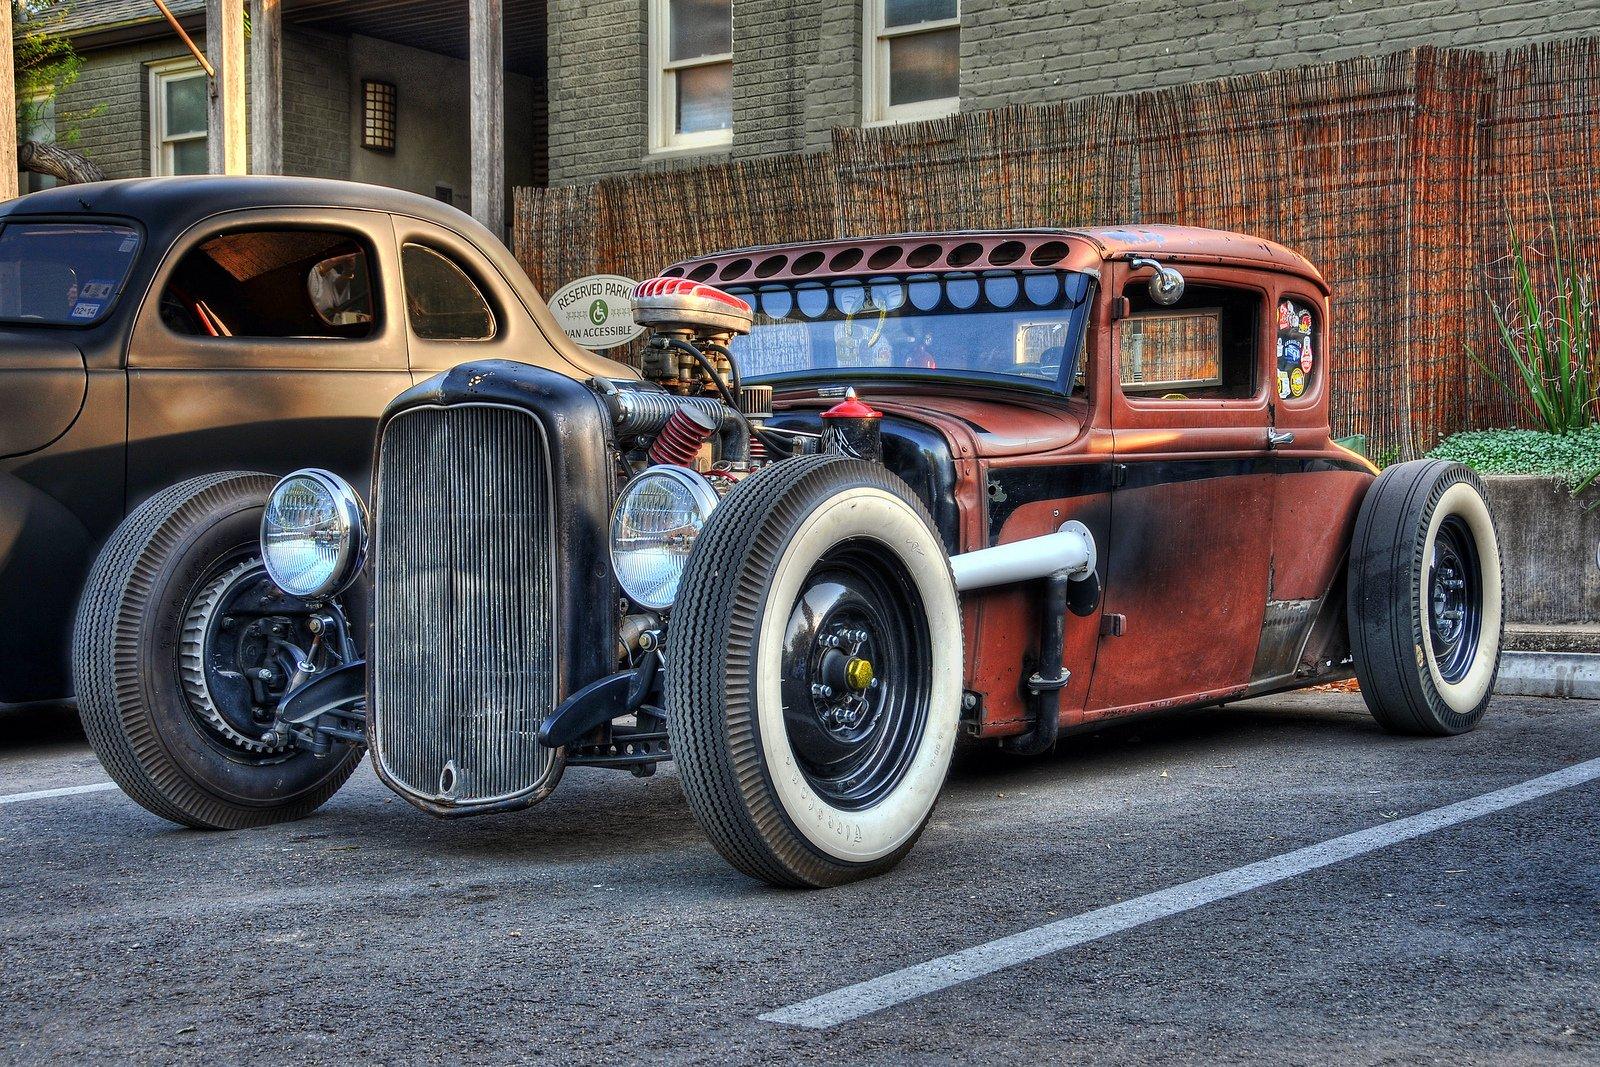 Street Rod hot rod custom cars lo rider vintage cars usa wallpaper 1600x1067